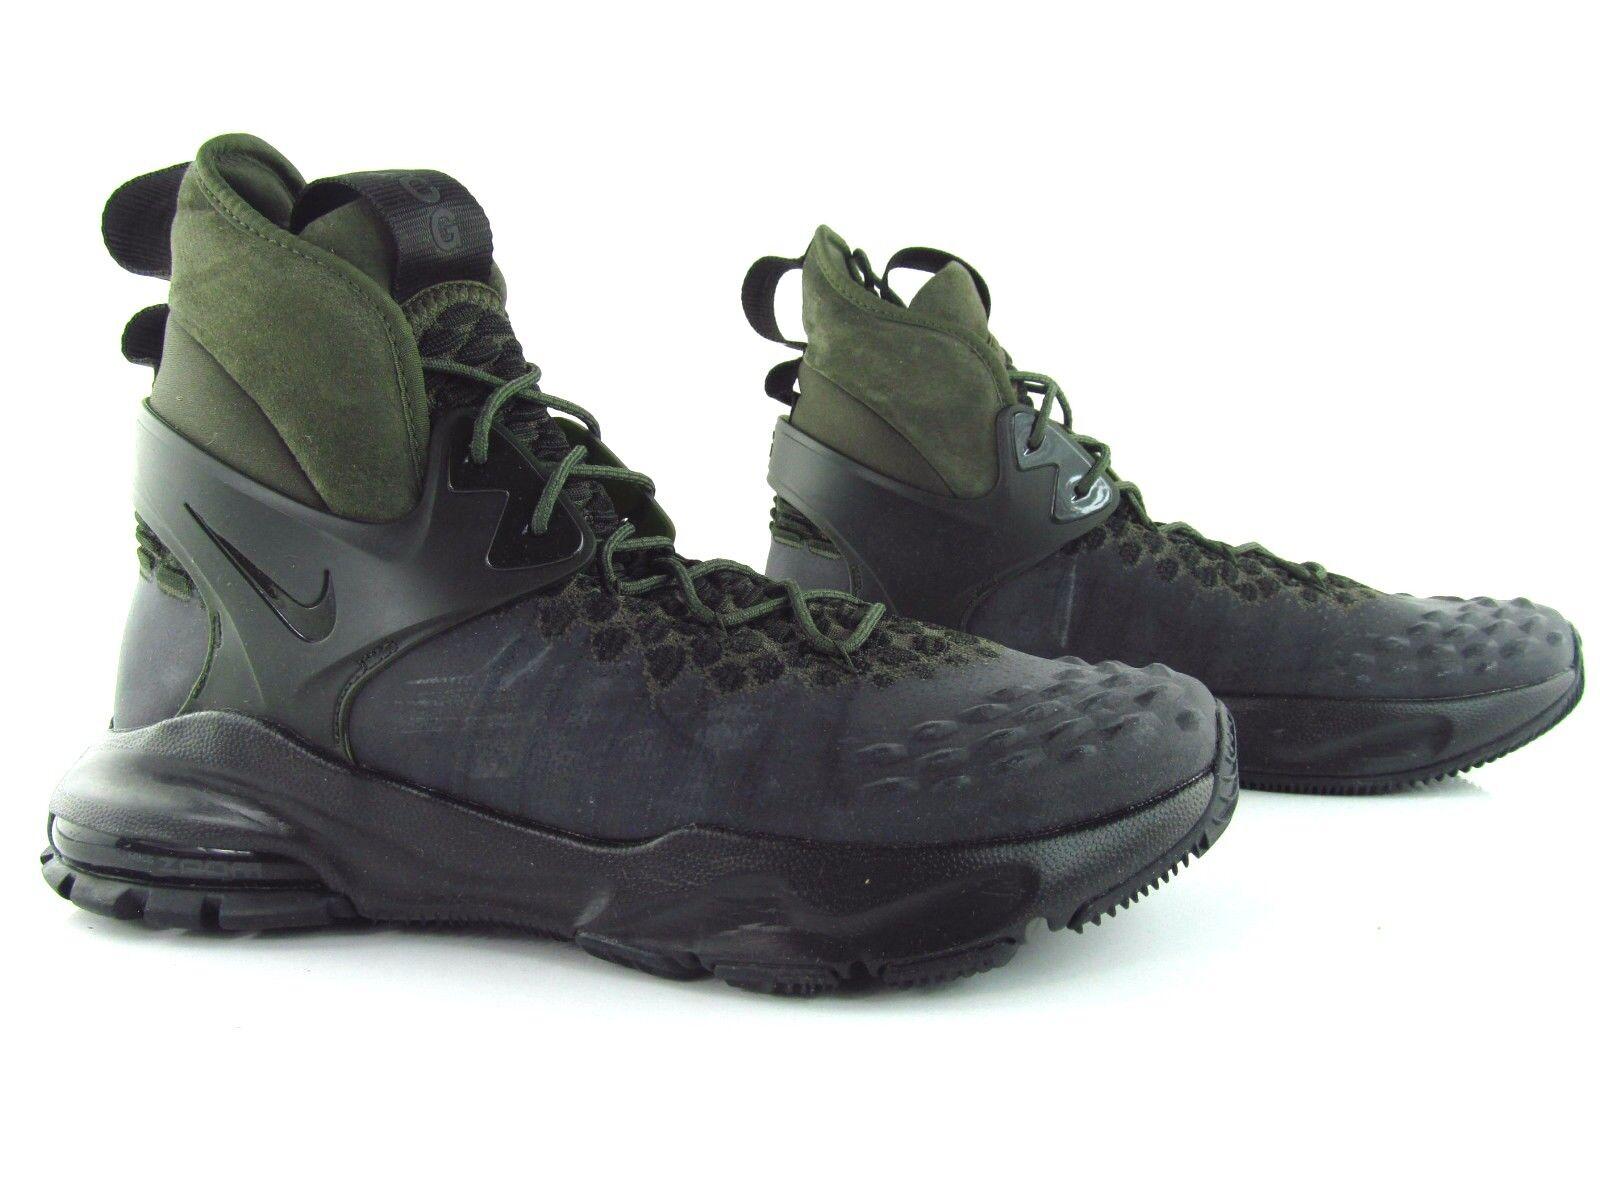 Nike nikelab zoom tallac flyknit acg un carico nero - kaki uk_7 us_8 eur 41